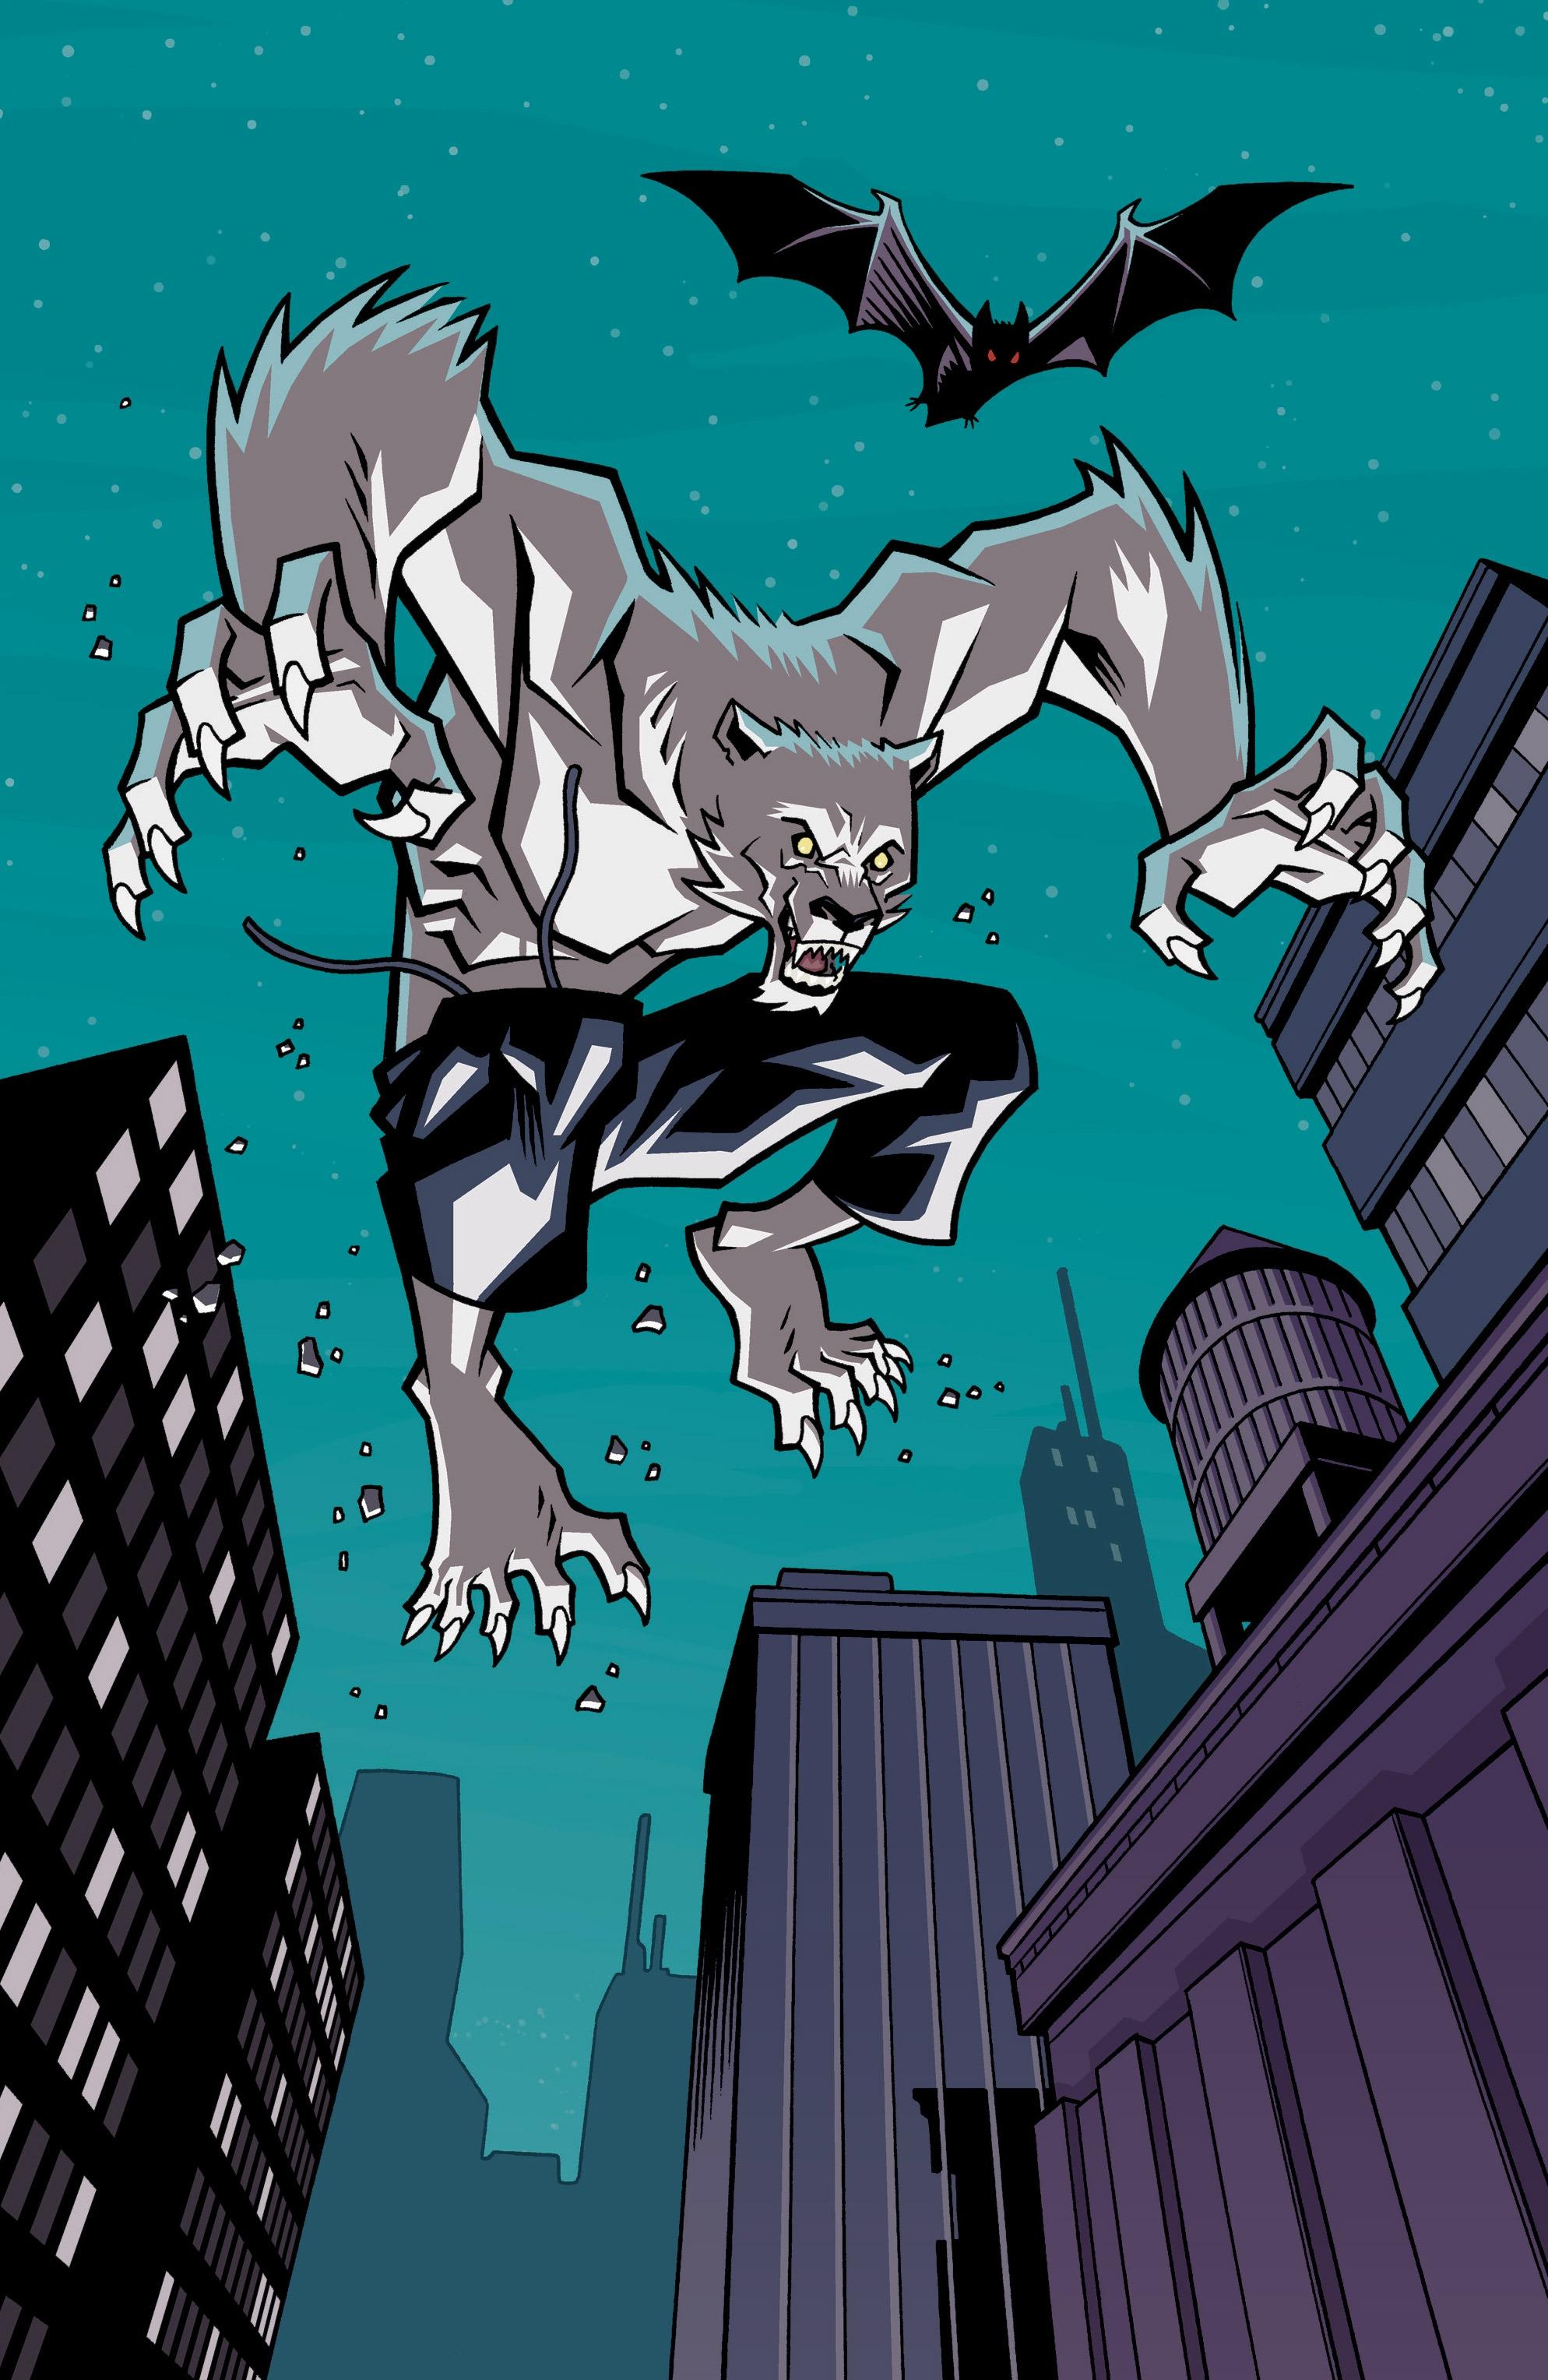 Astounding Wolf-Man Vol 1 2 001.jpg